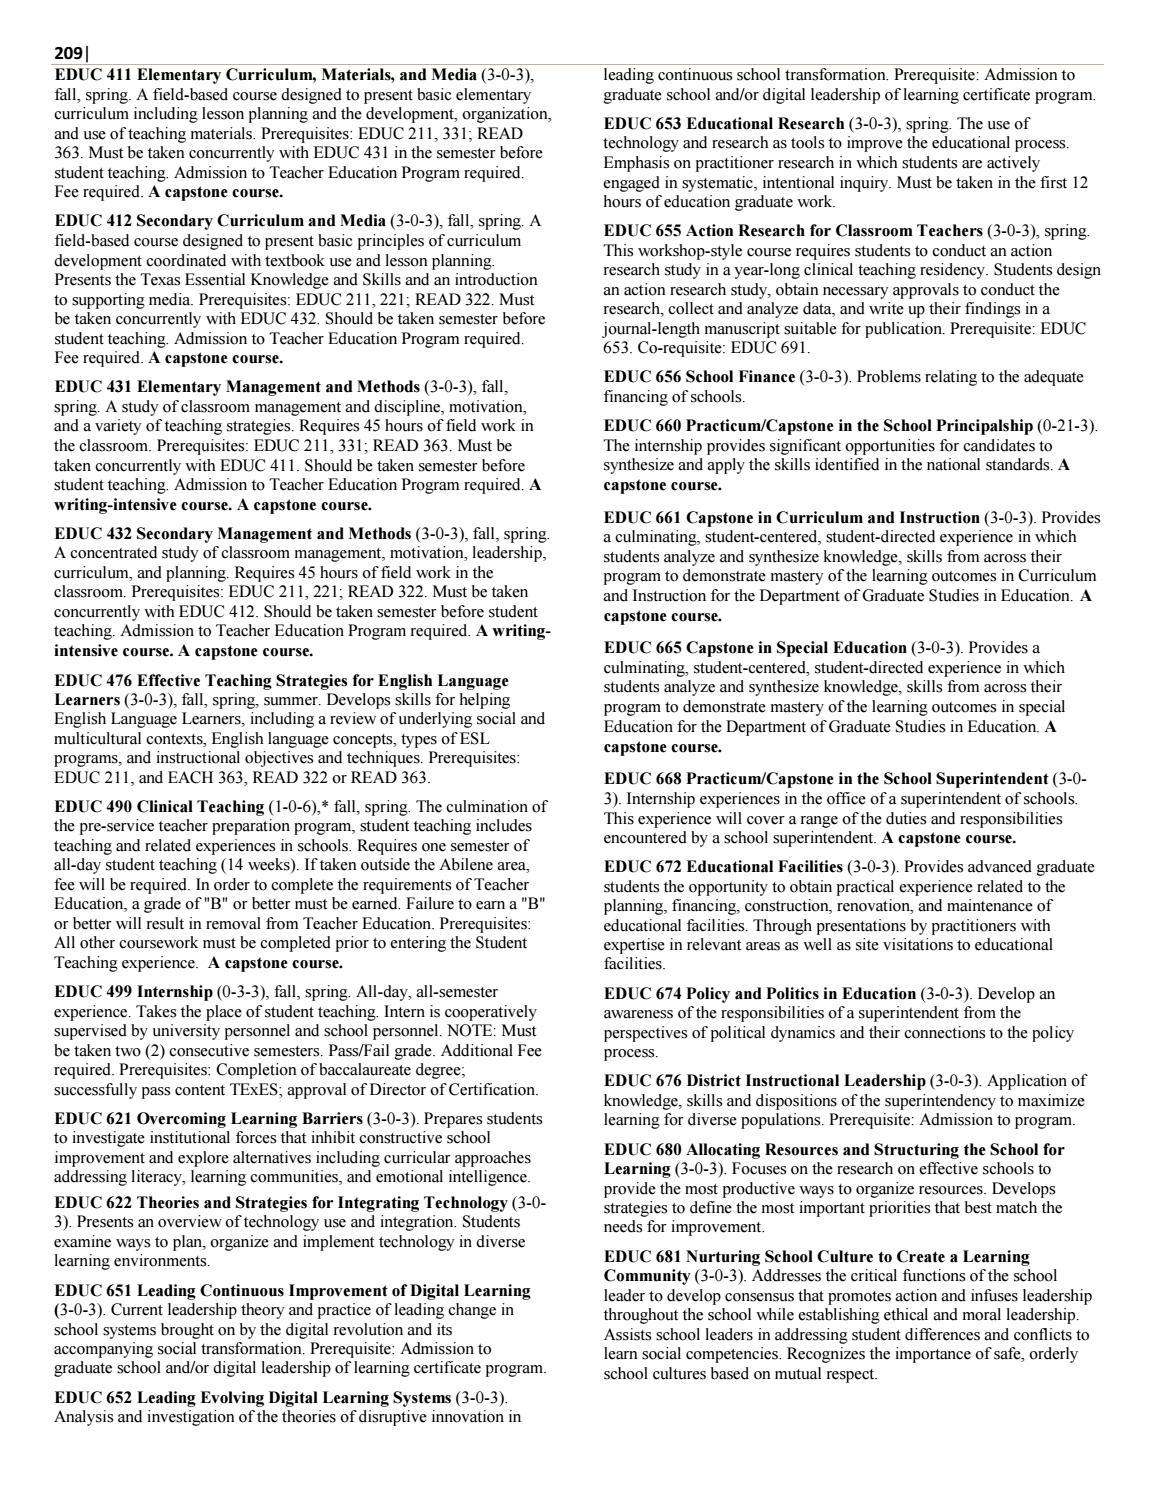 2016 17 Catalog By Abilene Christian University Issuu